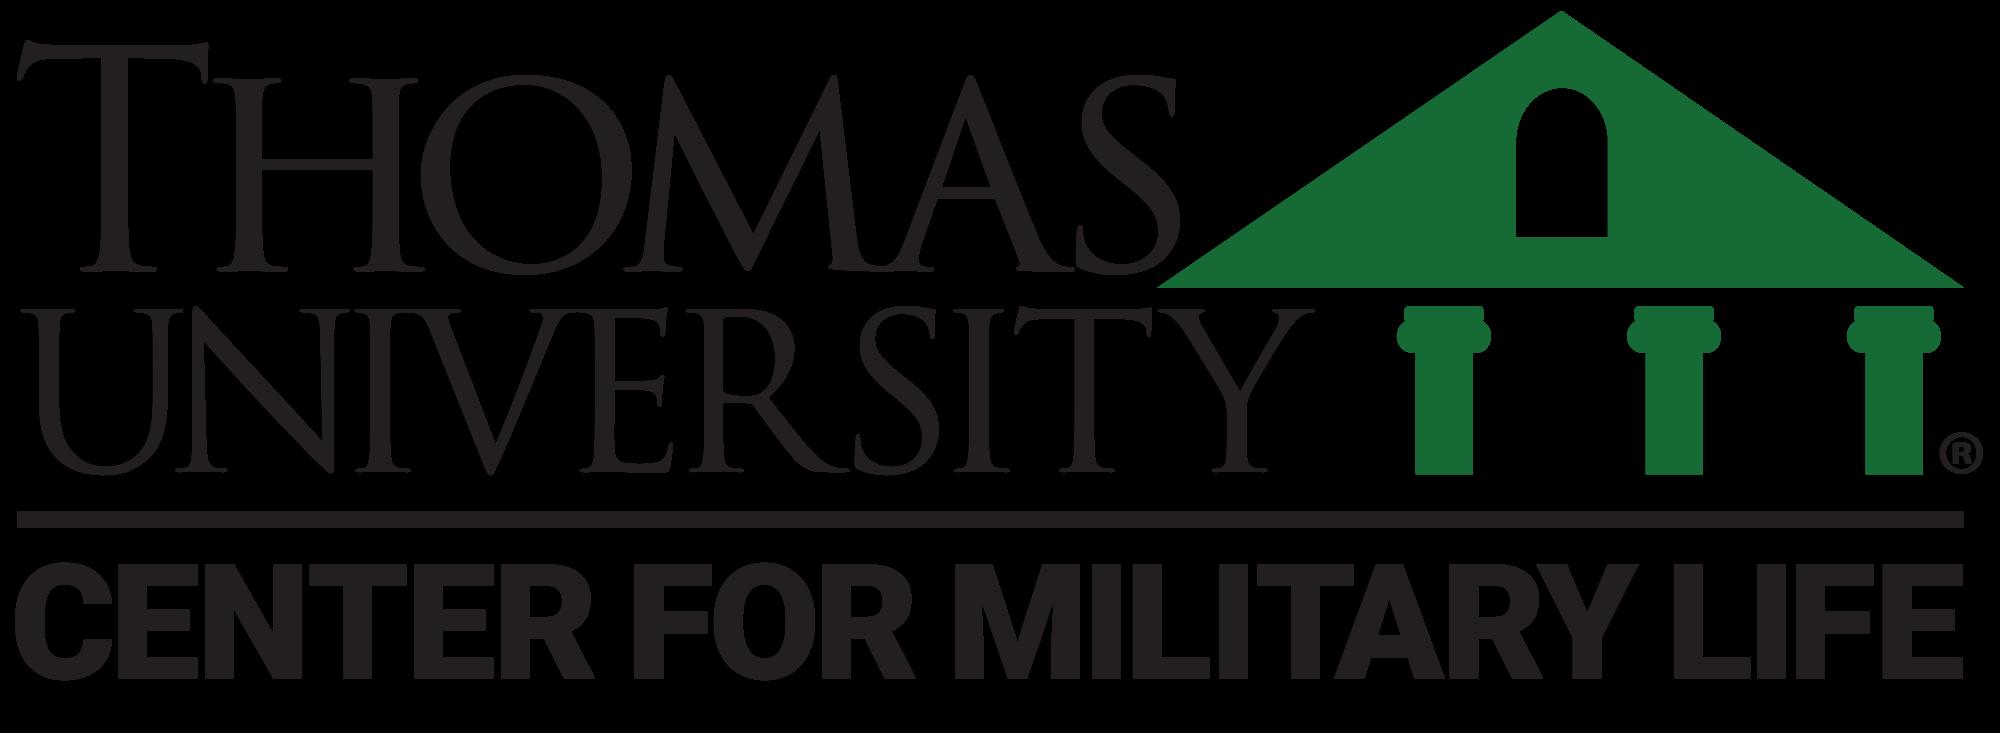 Thomas University Center for Military Life